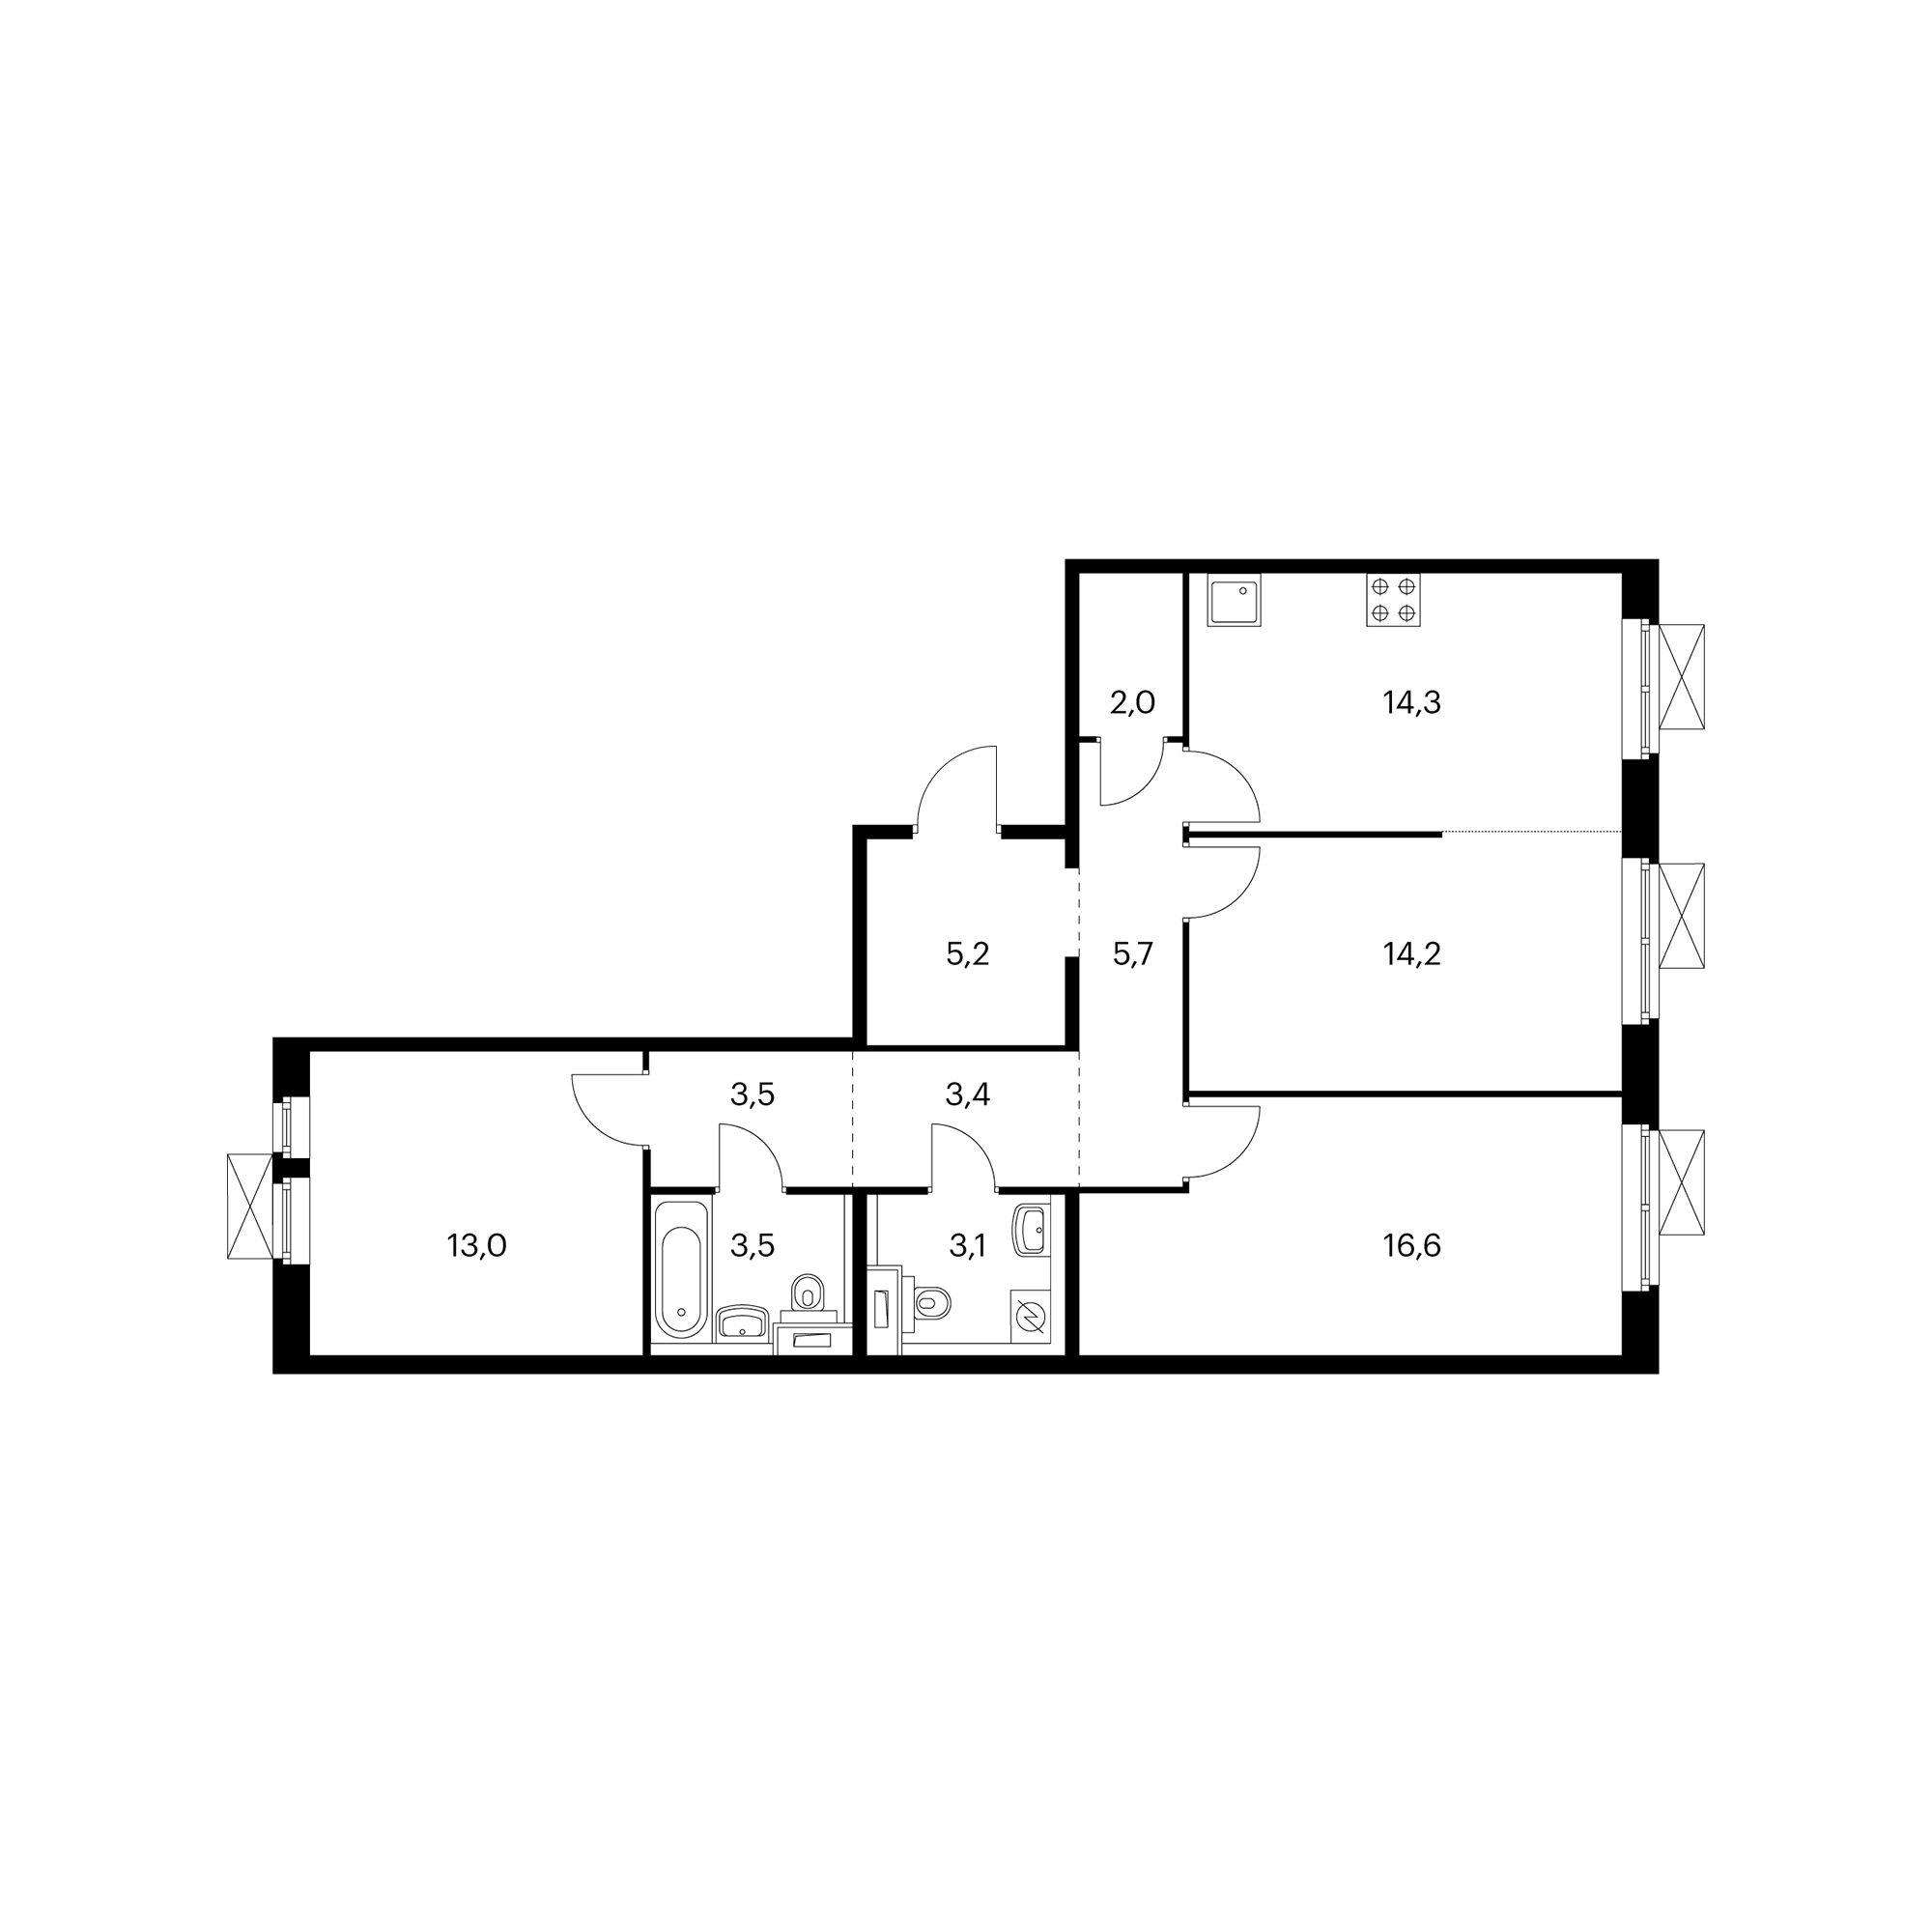 3KL13_9.0-1_S_Z2